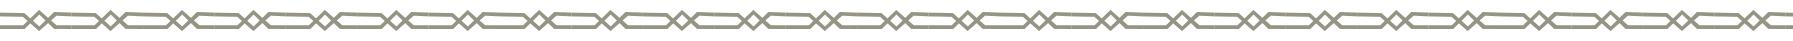 Grey Chain Shorter.jpg